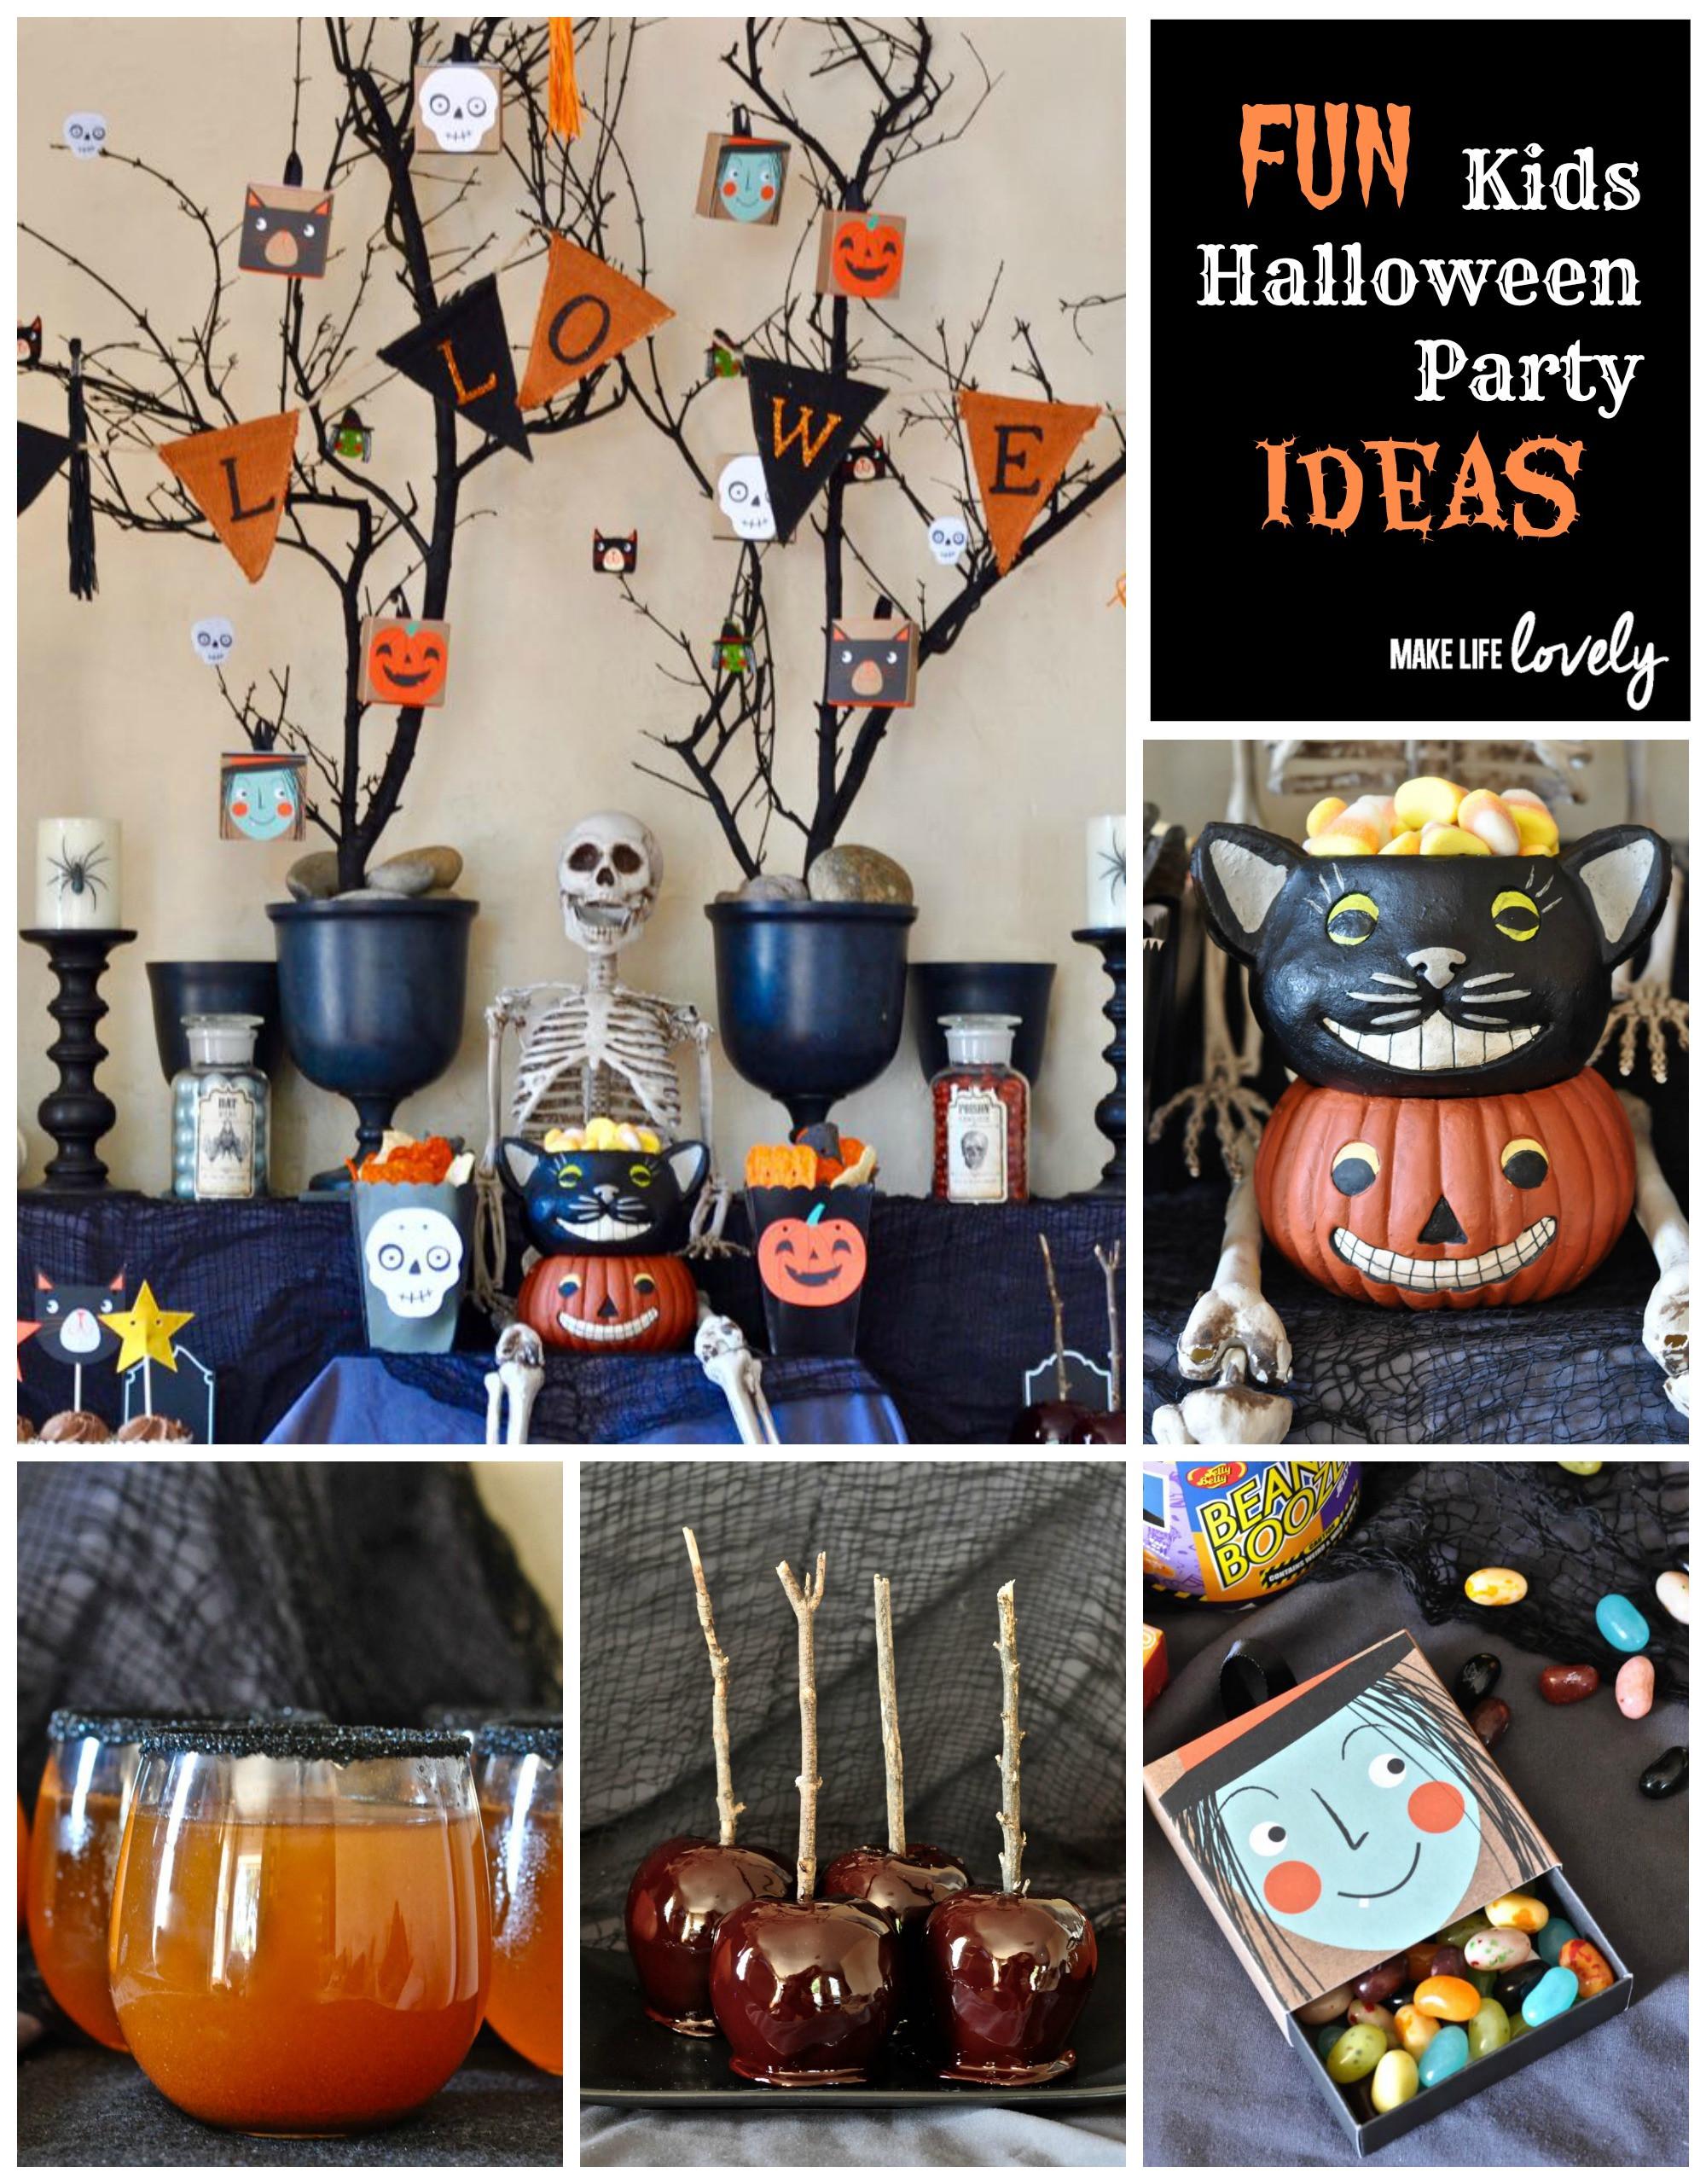 Kids Halloween Party Ideas  kids Halloween party